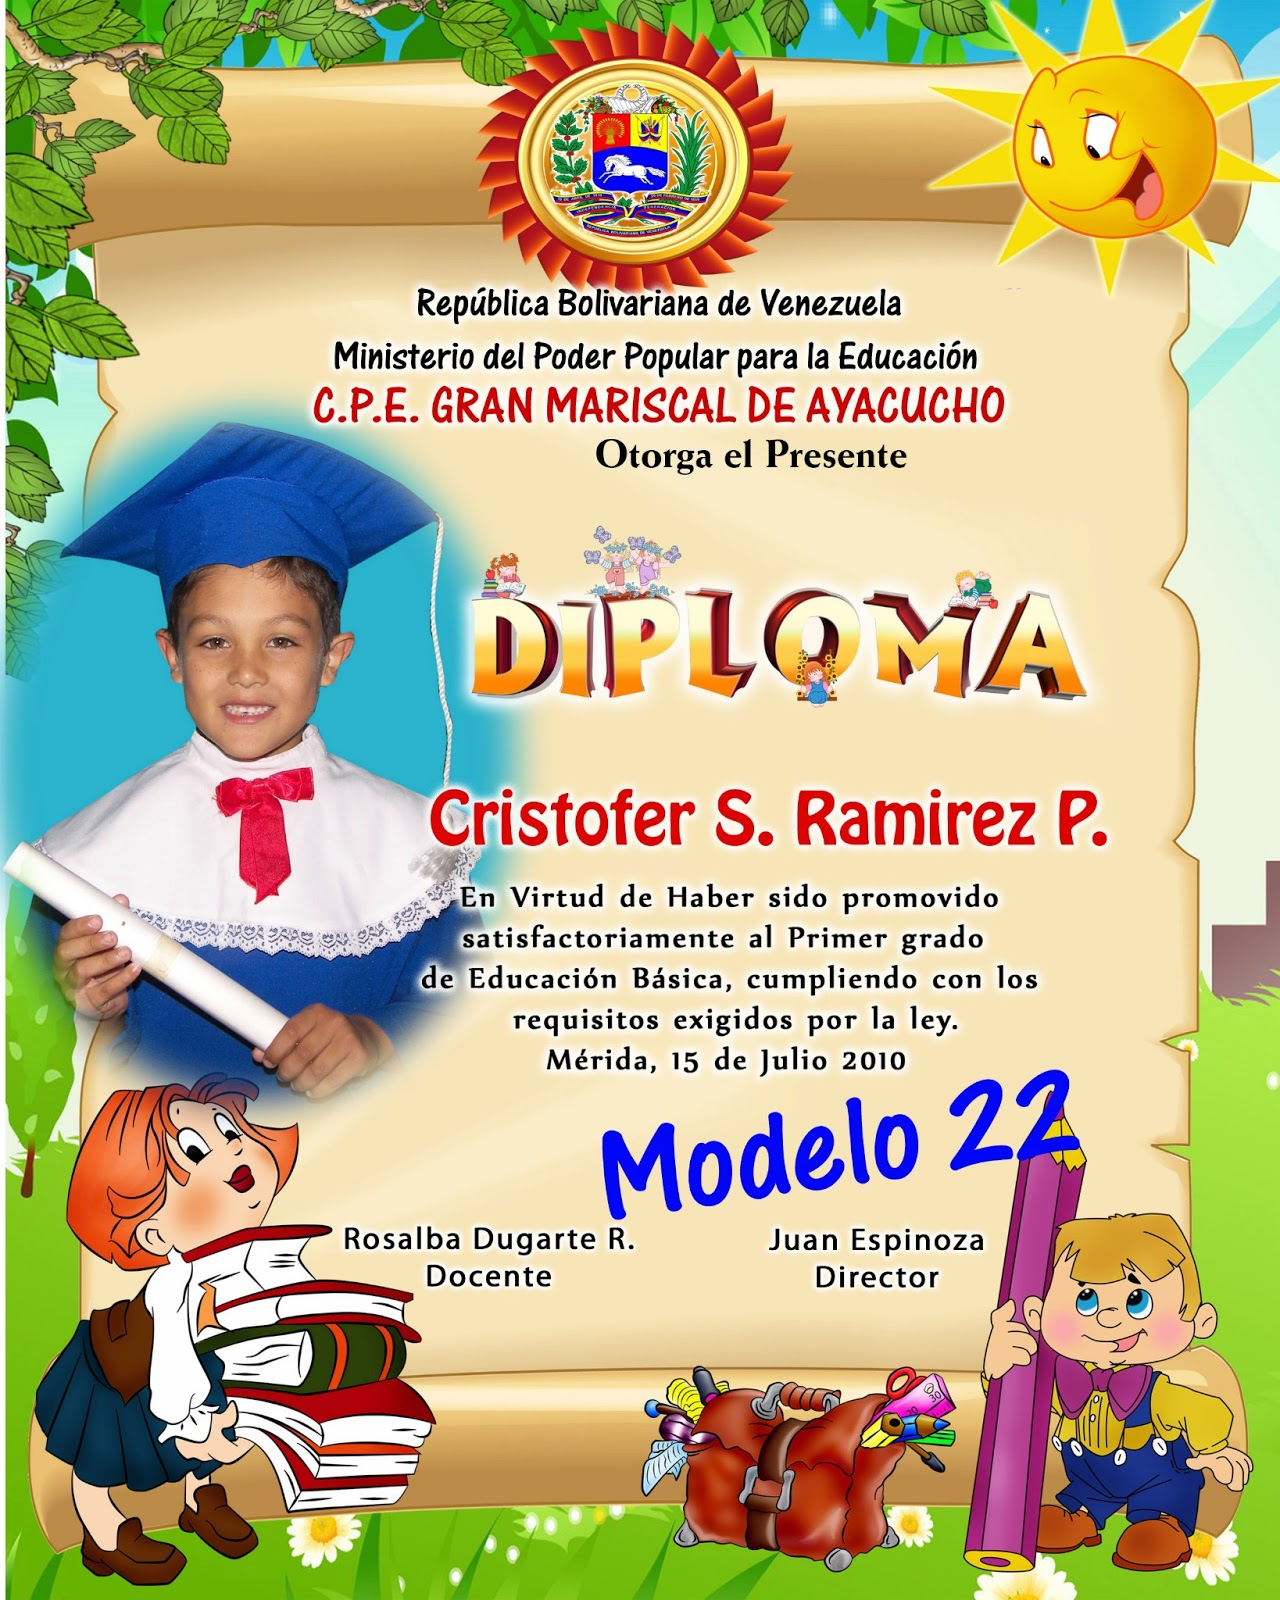 Diplomas de preescolar para editar gratis | Imagenes para imprimir